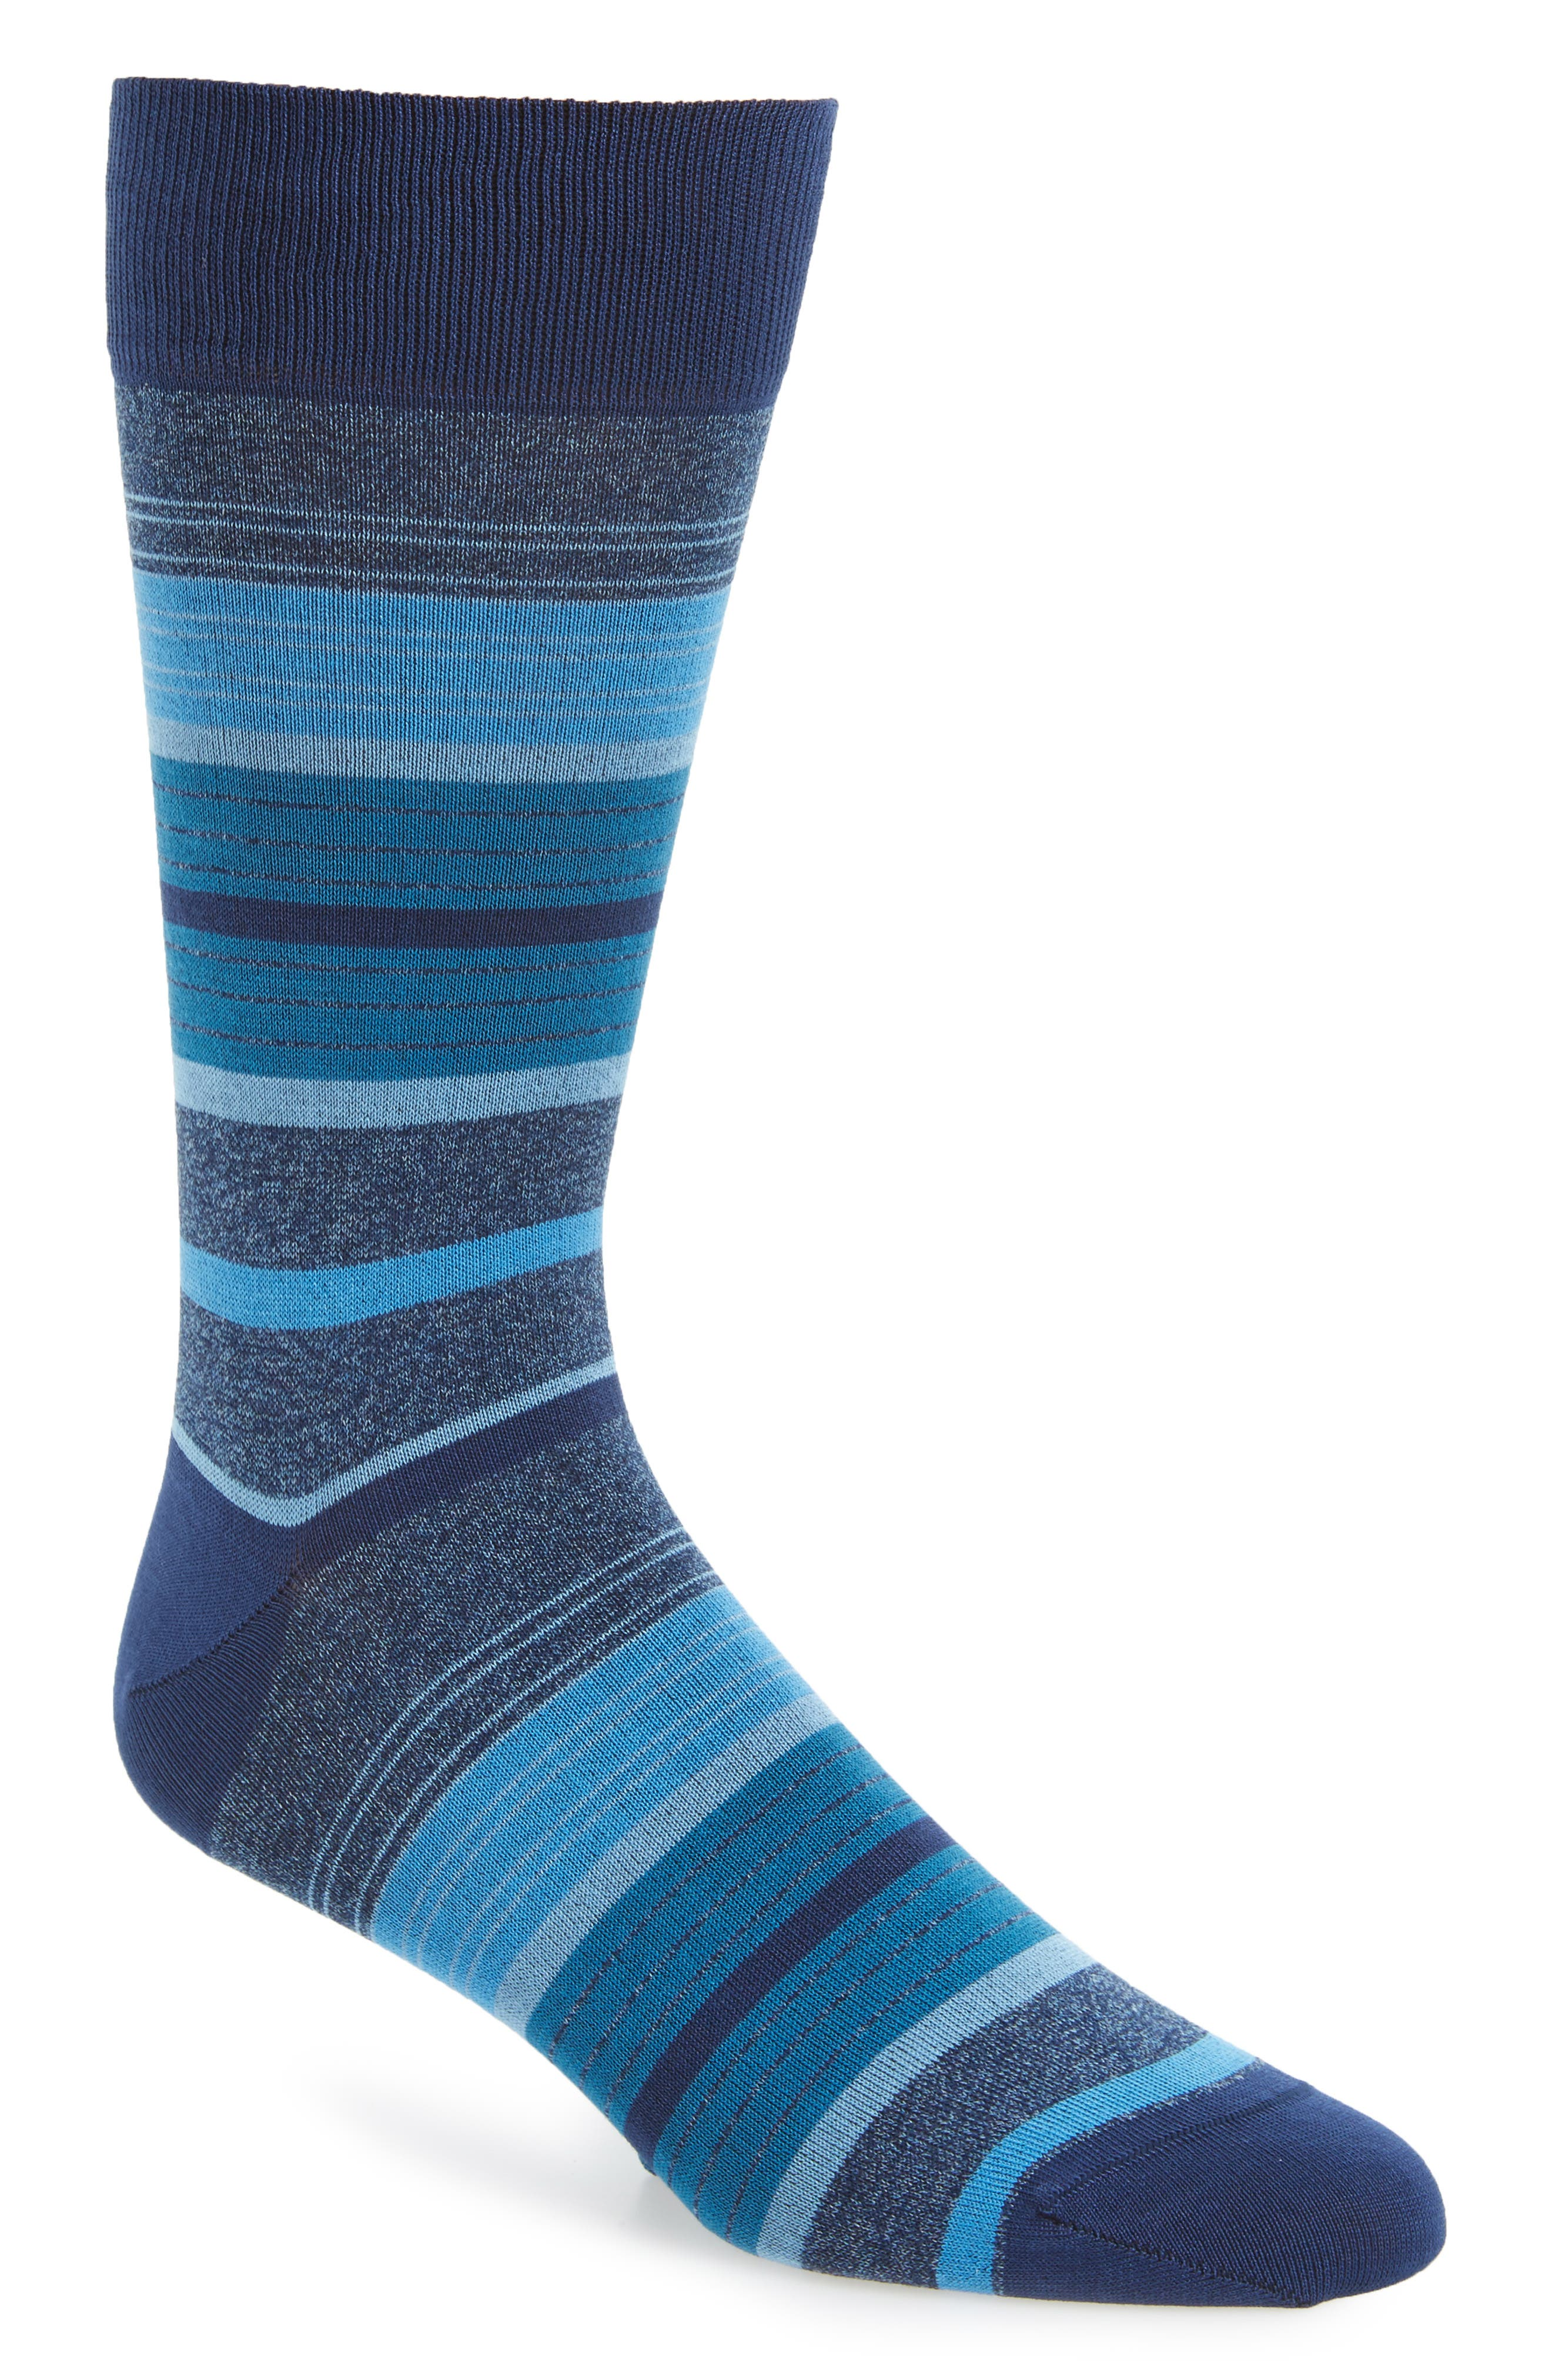 Stripe Mercerized Blend Socks,                             Main thumbnail 1, color,                             411